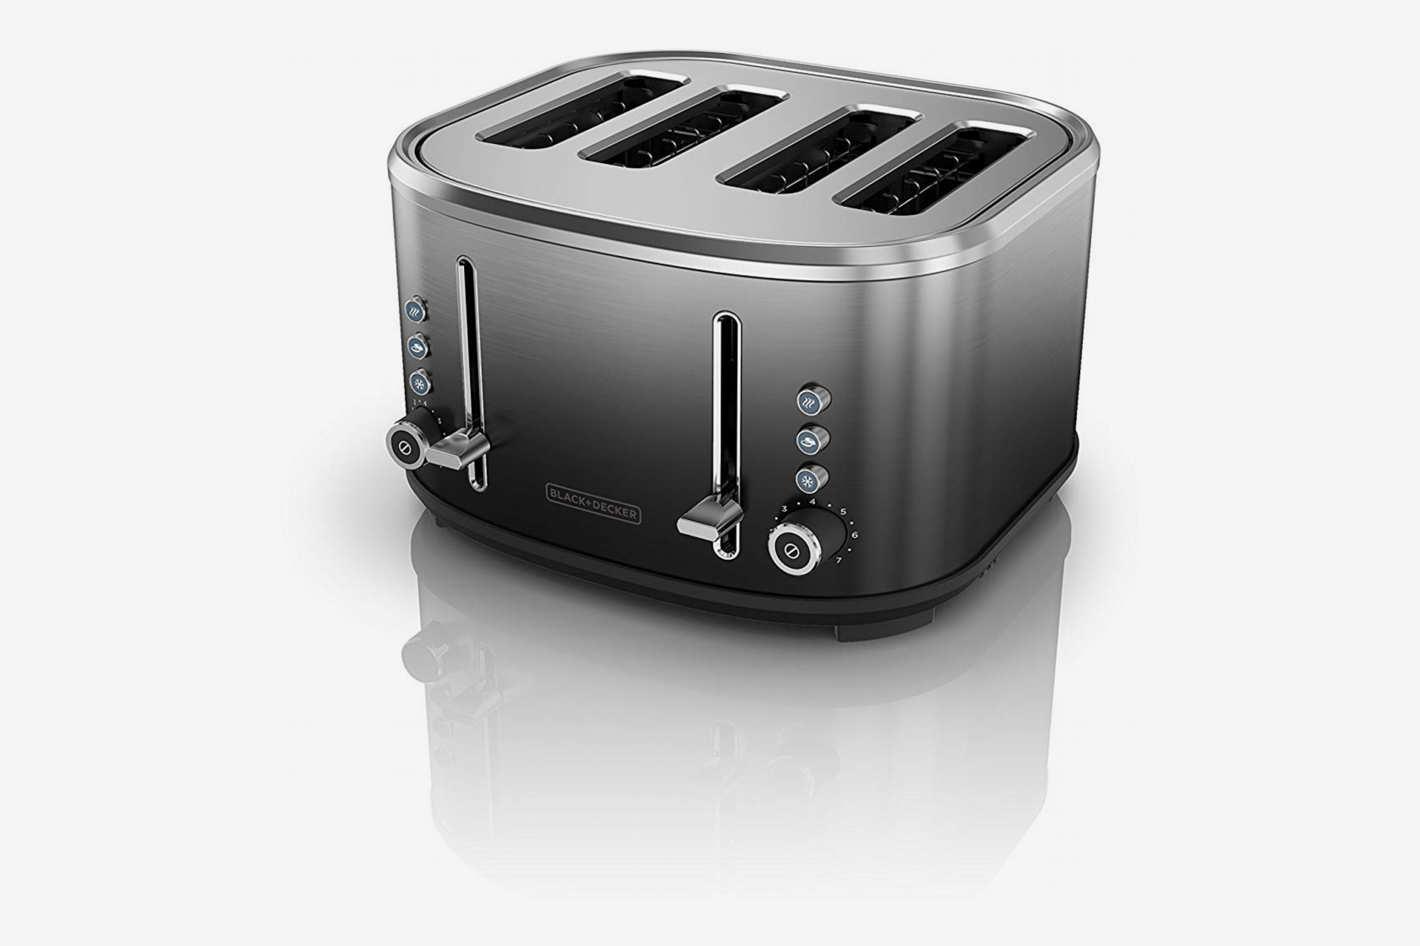 BLACK+DECKER 4-Slice Extra-Wide Slot Toaster, Stainless Steel